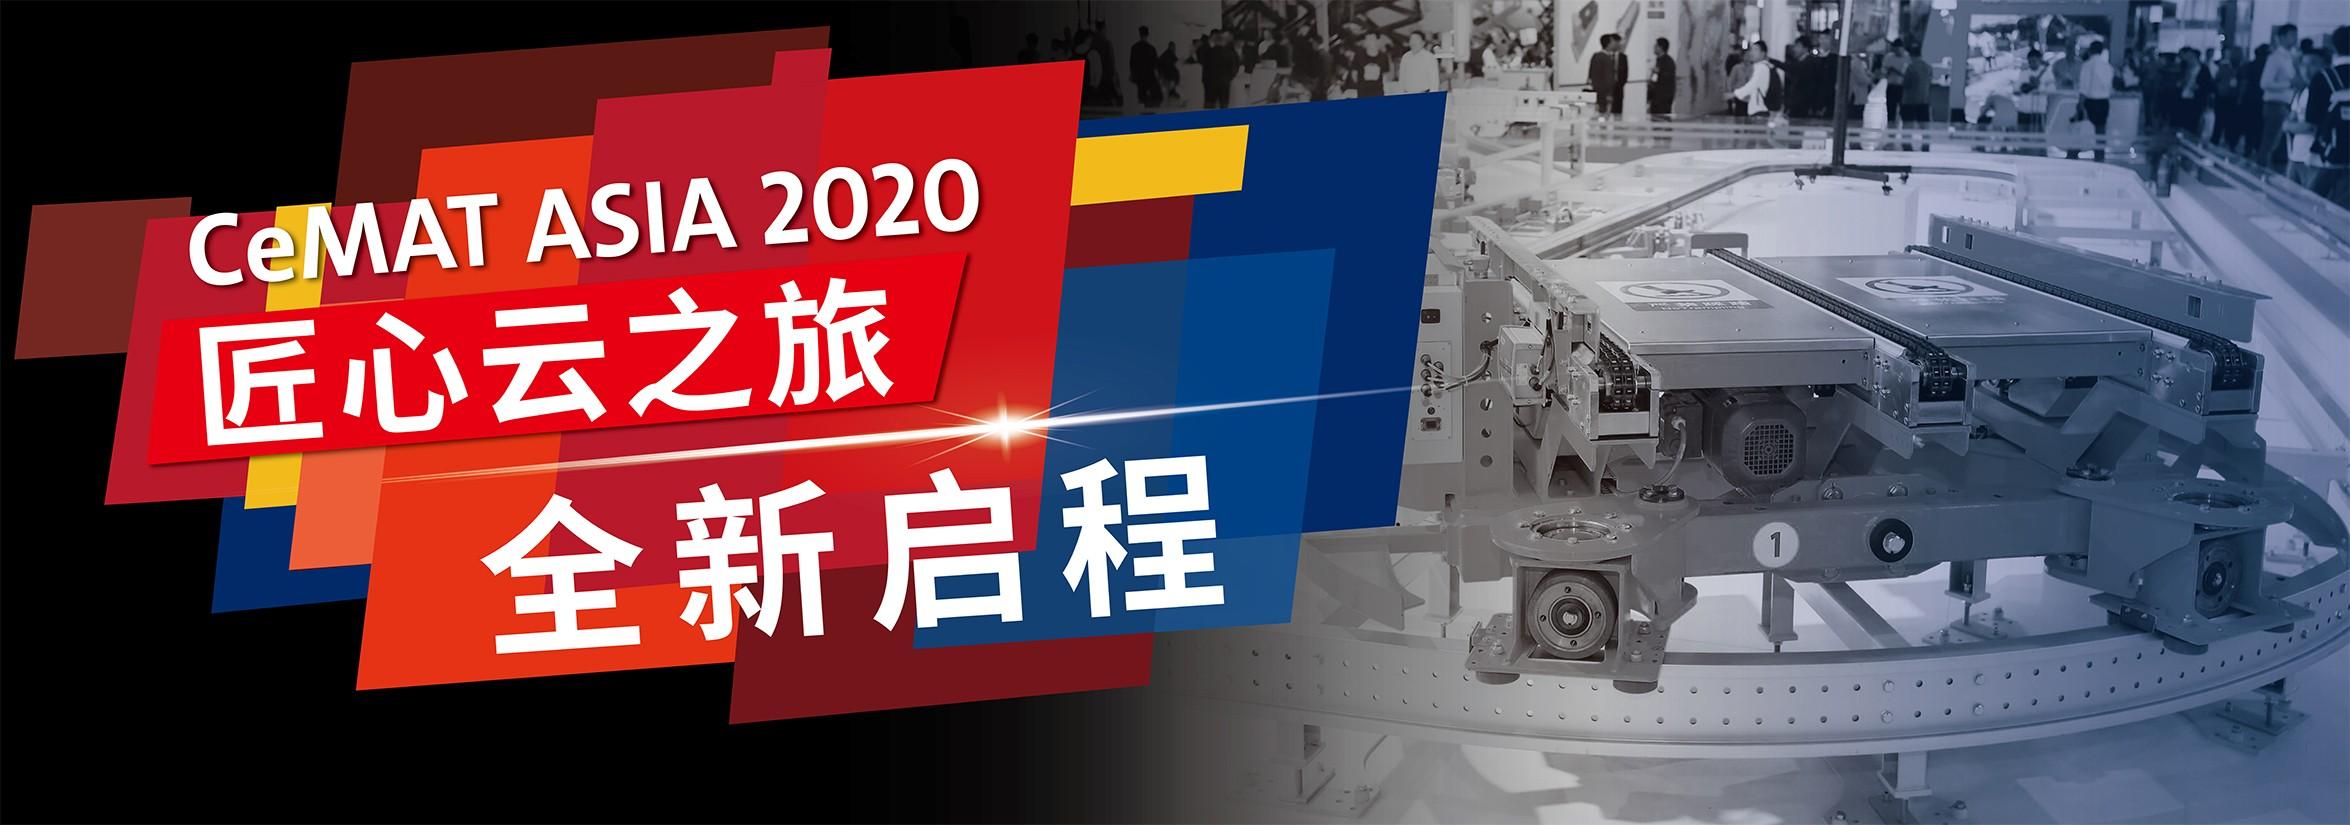 20cemat-匠心之旅-banner-2350-825 -cn_画板 1 副本 8.jpg